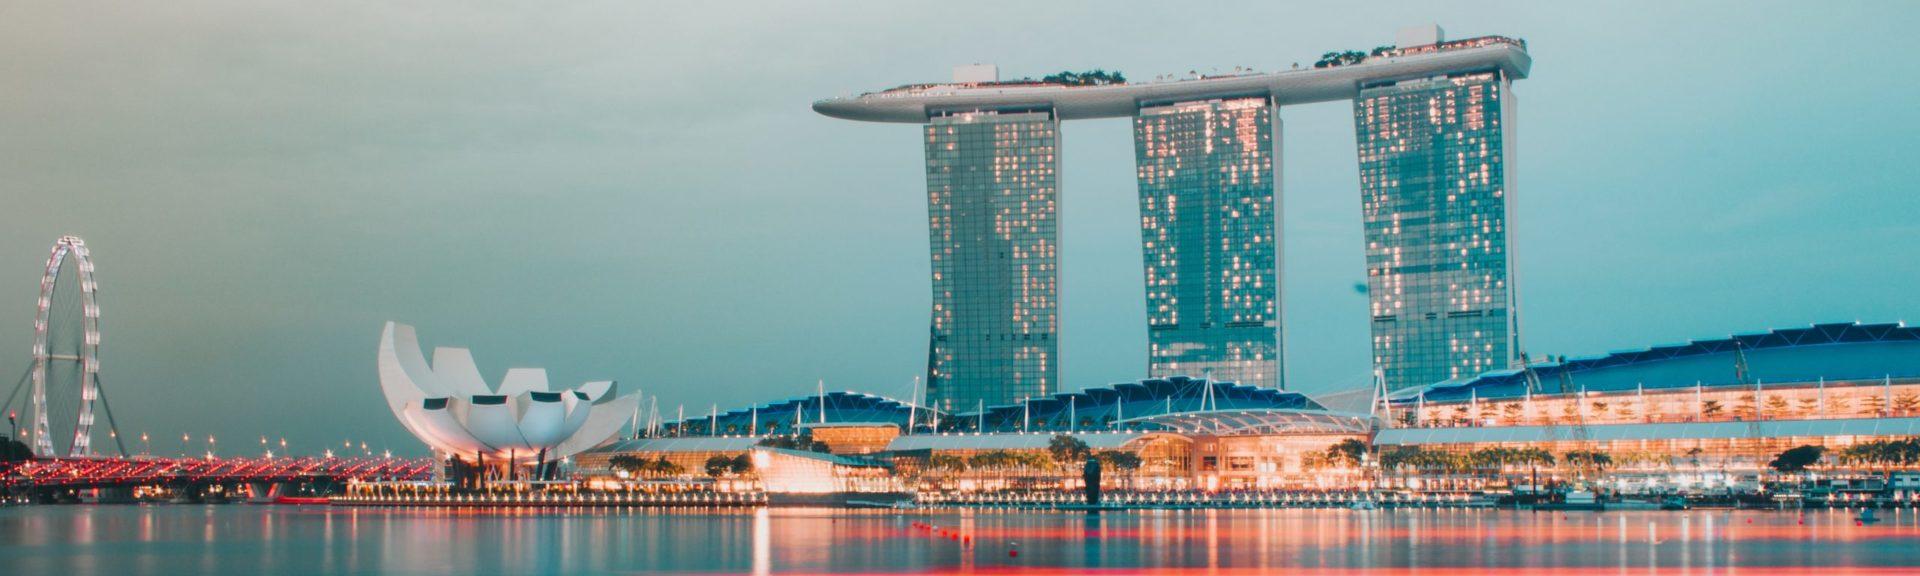 Foresight LIMSL Singapore